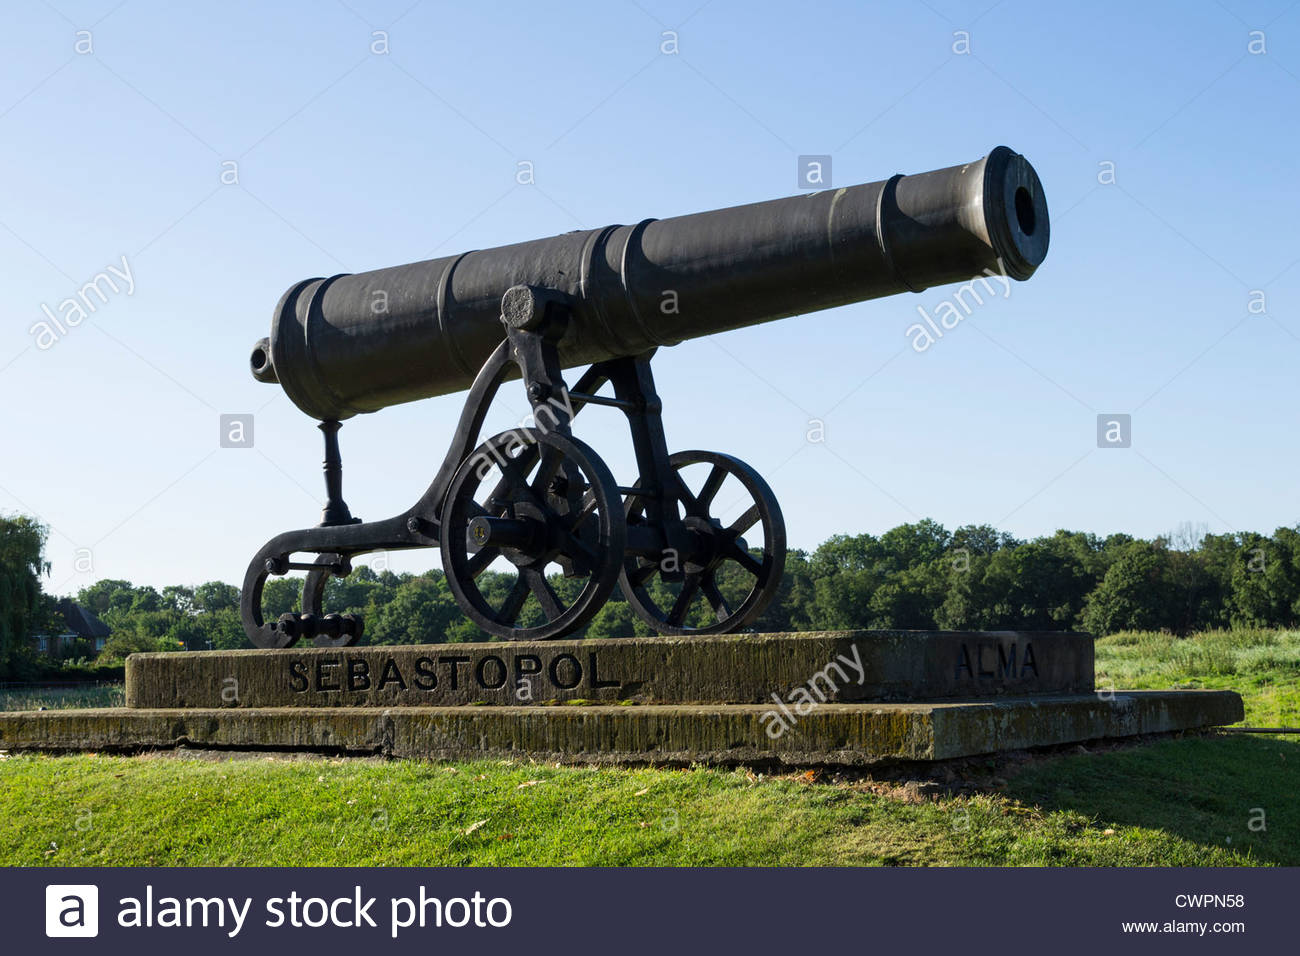 The Sebastopol Cannon on Brampton Road, Huntingdon, England. - Stock Image